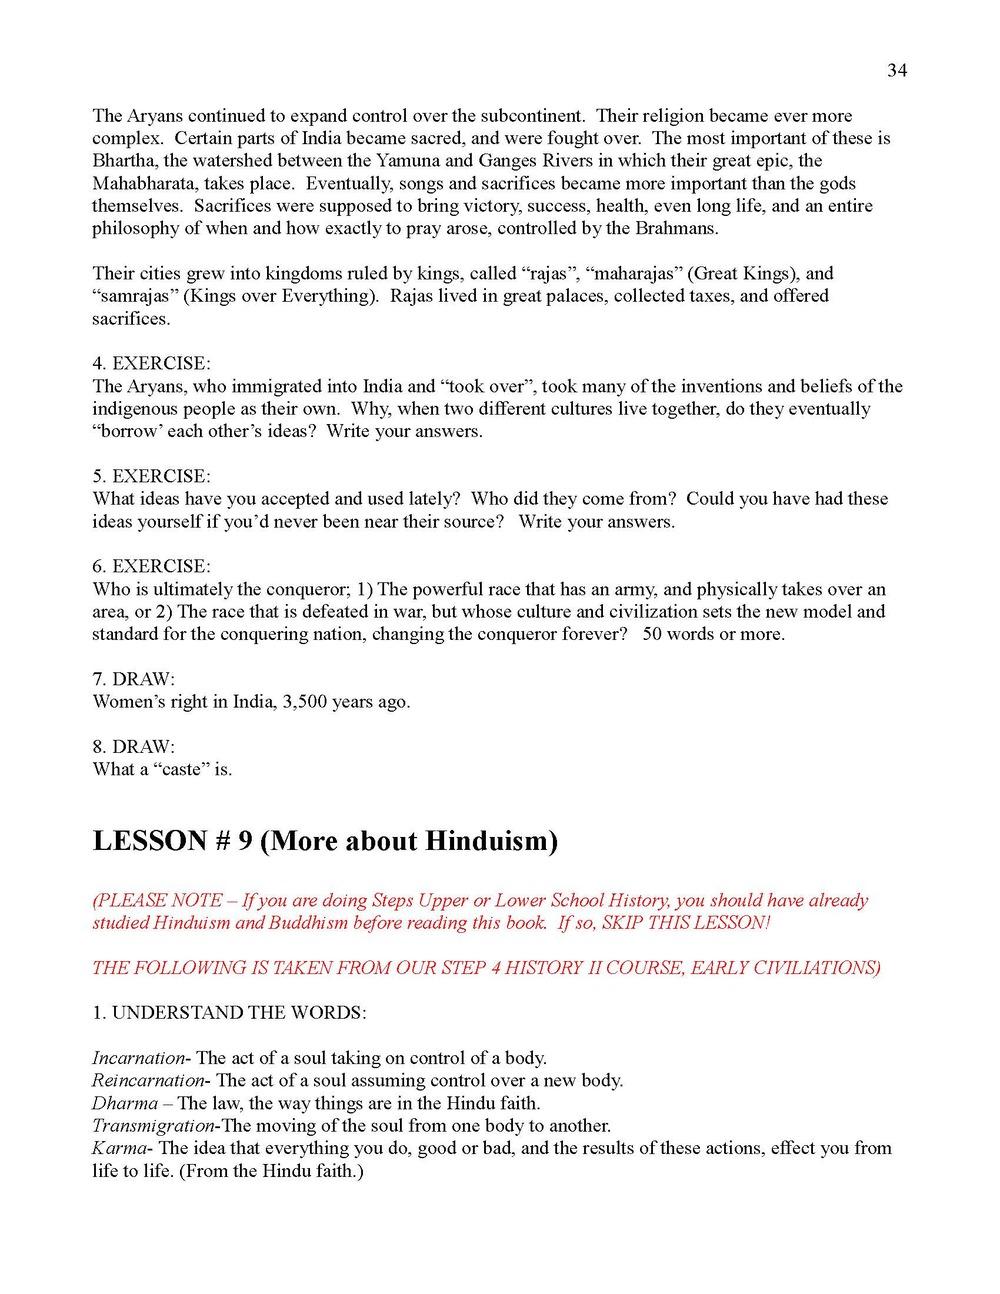 Step 4 Literature Guide - Siddhartha_Page_035.jpg